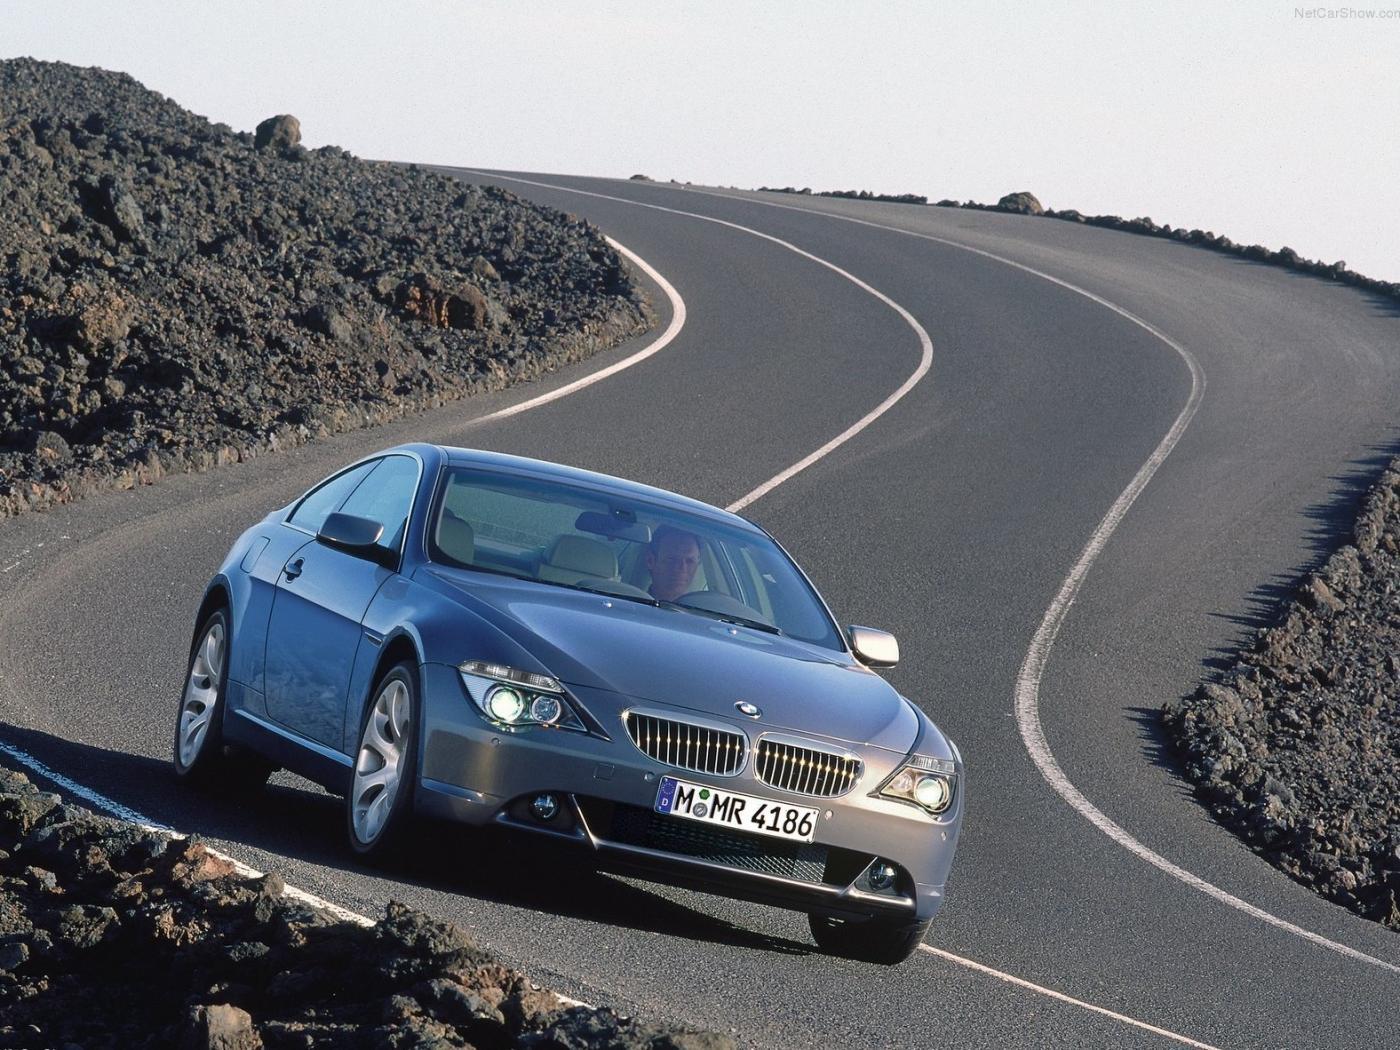 BMW-645Ci-E63.jpeg